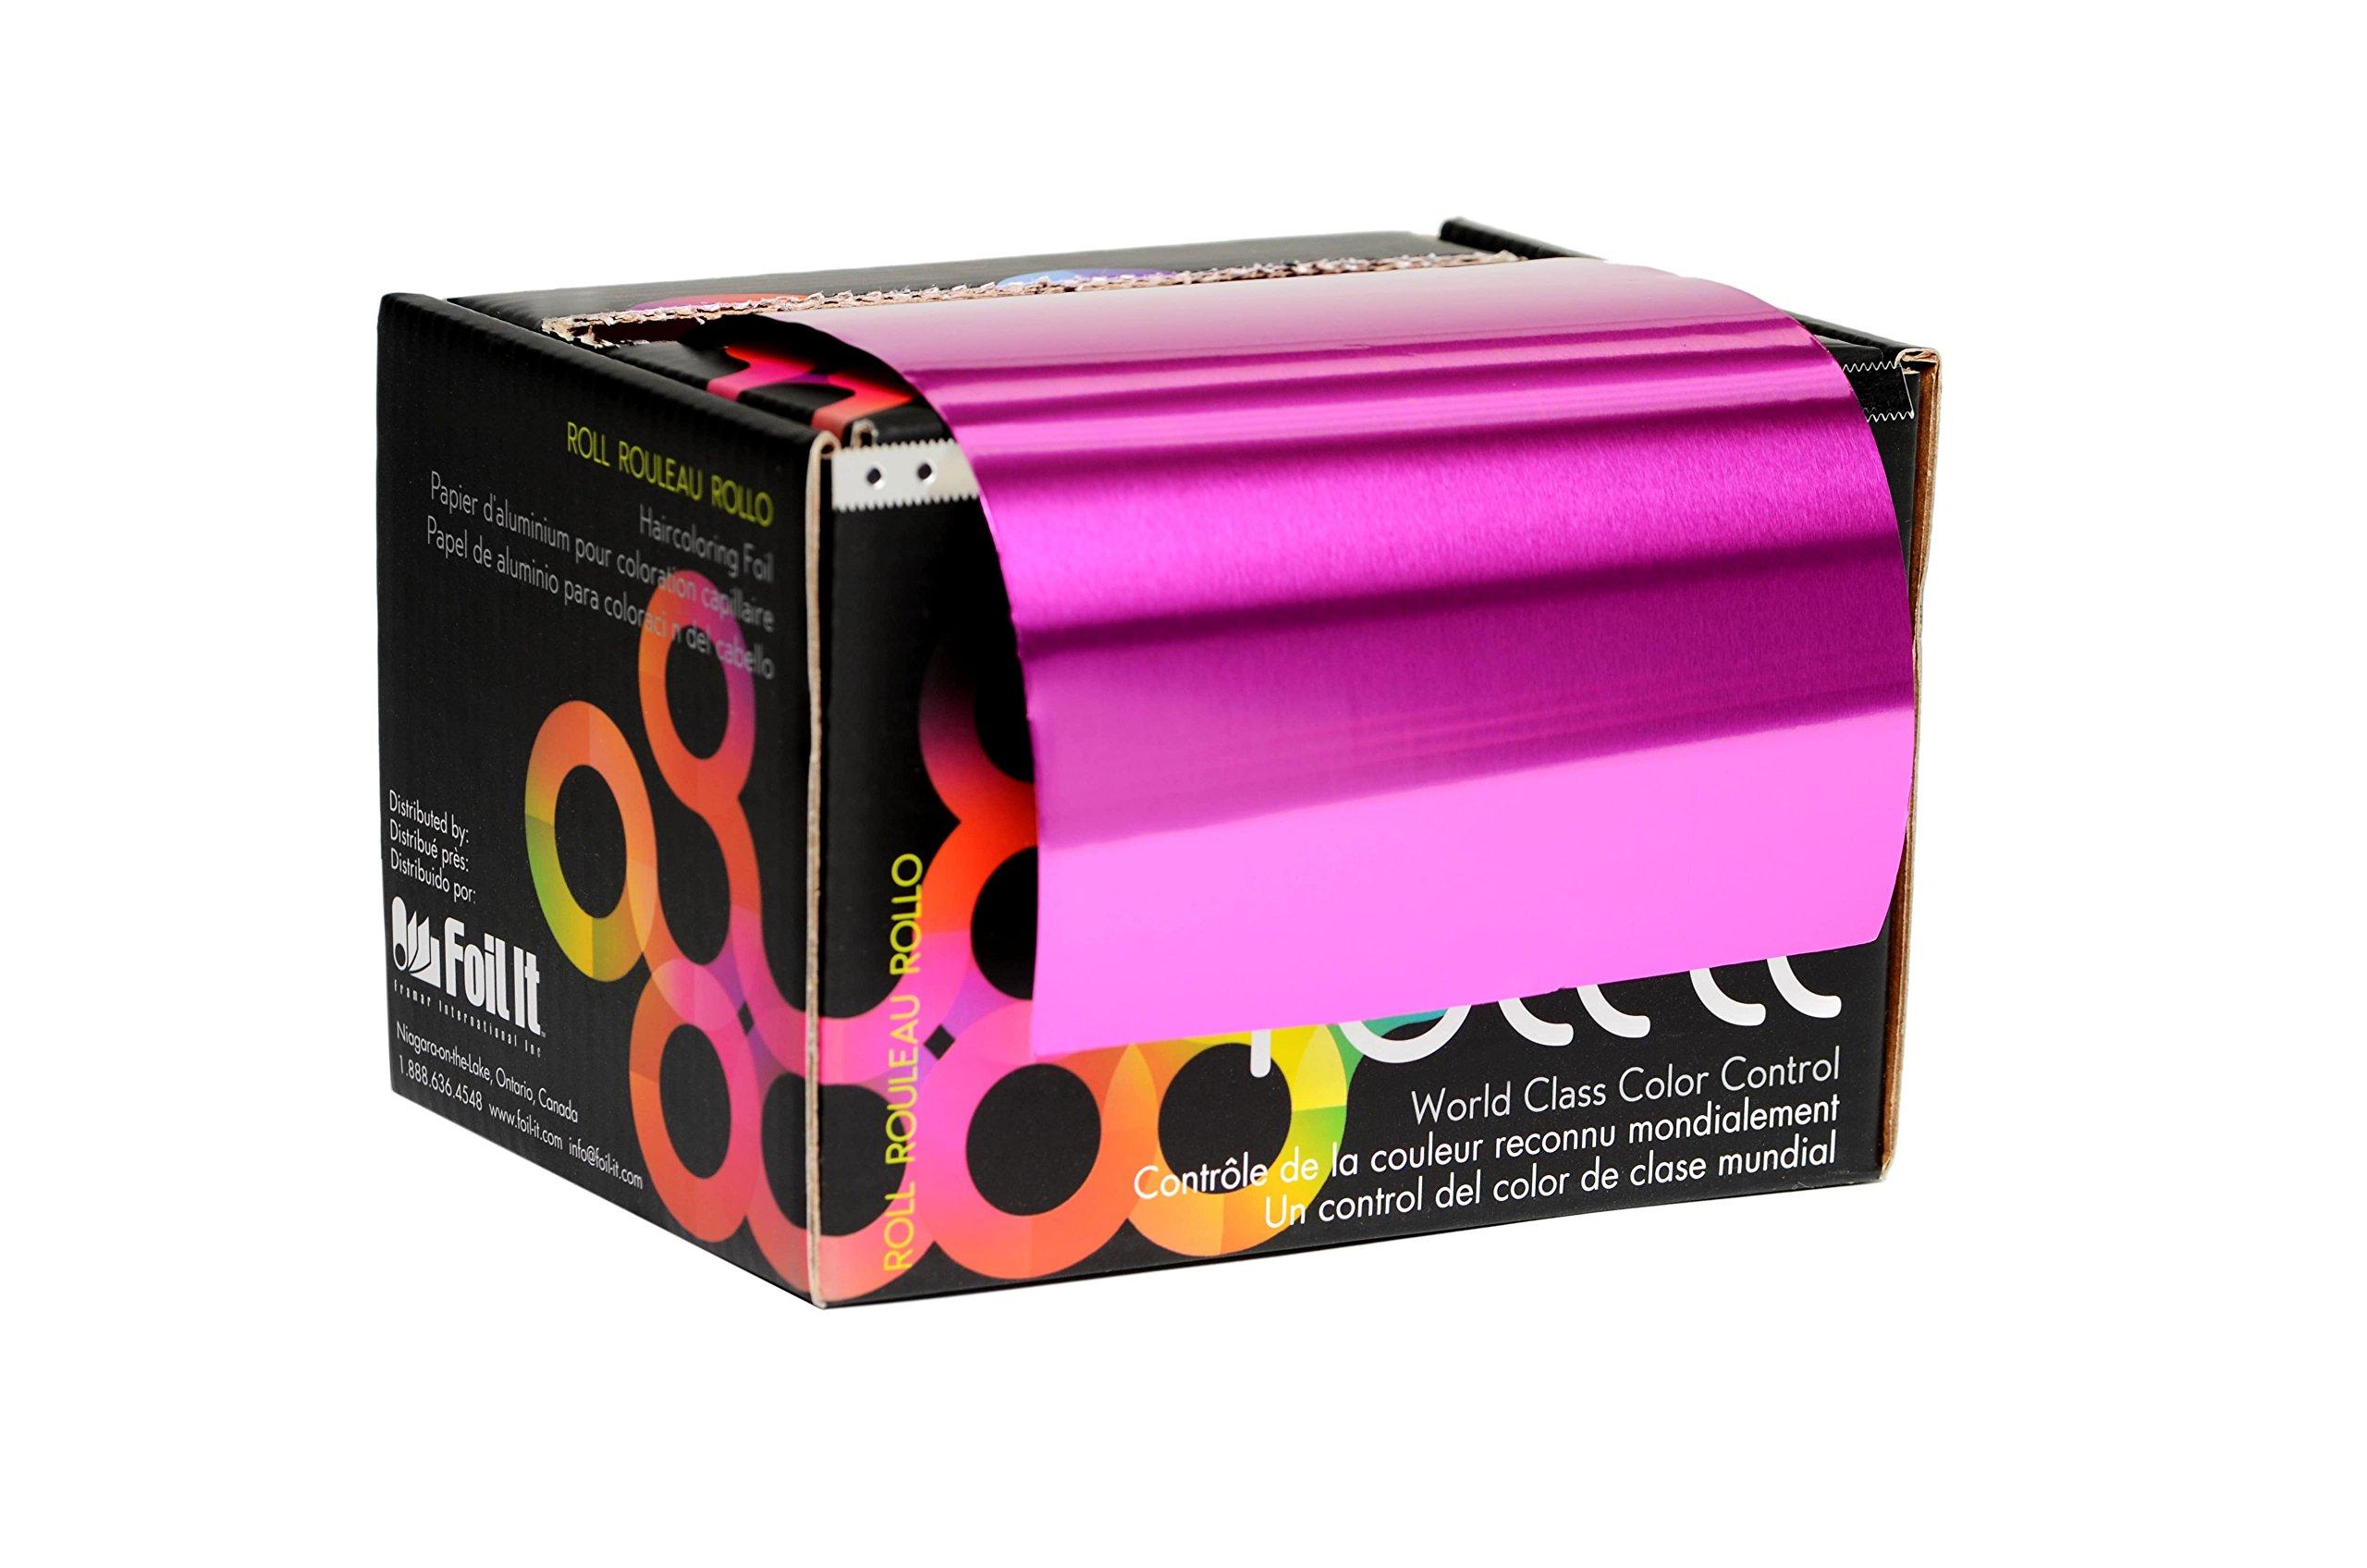 Framar Magenta Aluminum Foil Roll, Foil Paper- Medium 1600 ft by FRAMAR (Image #2)